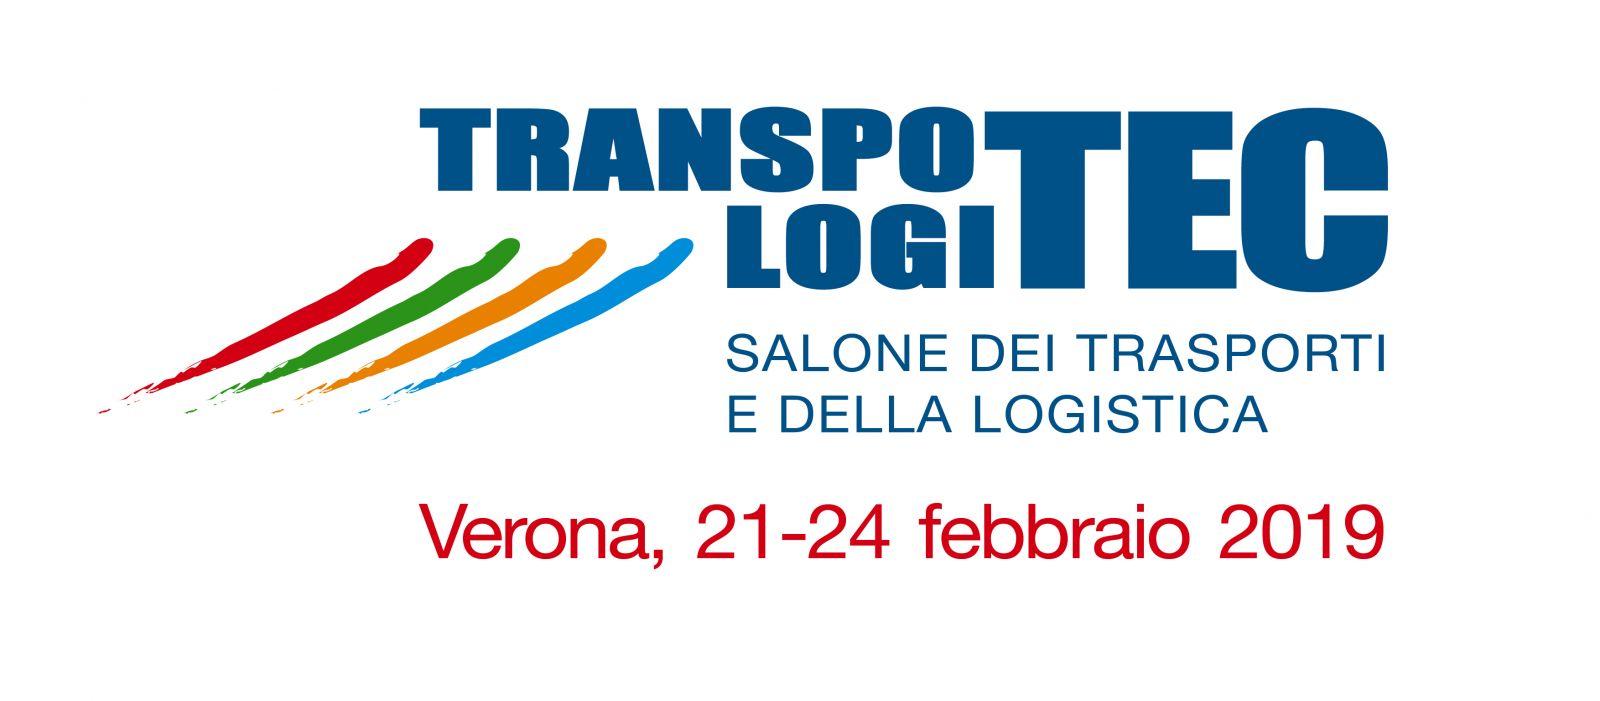 Transpotec Logitec 2019: Viasat presented TMS, new solution for Fleet Management